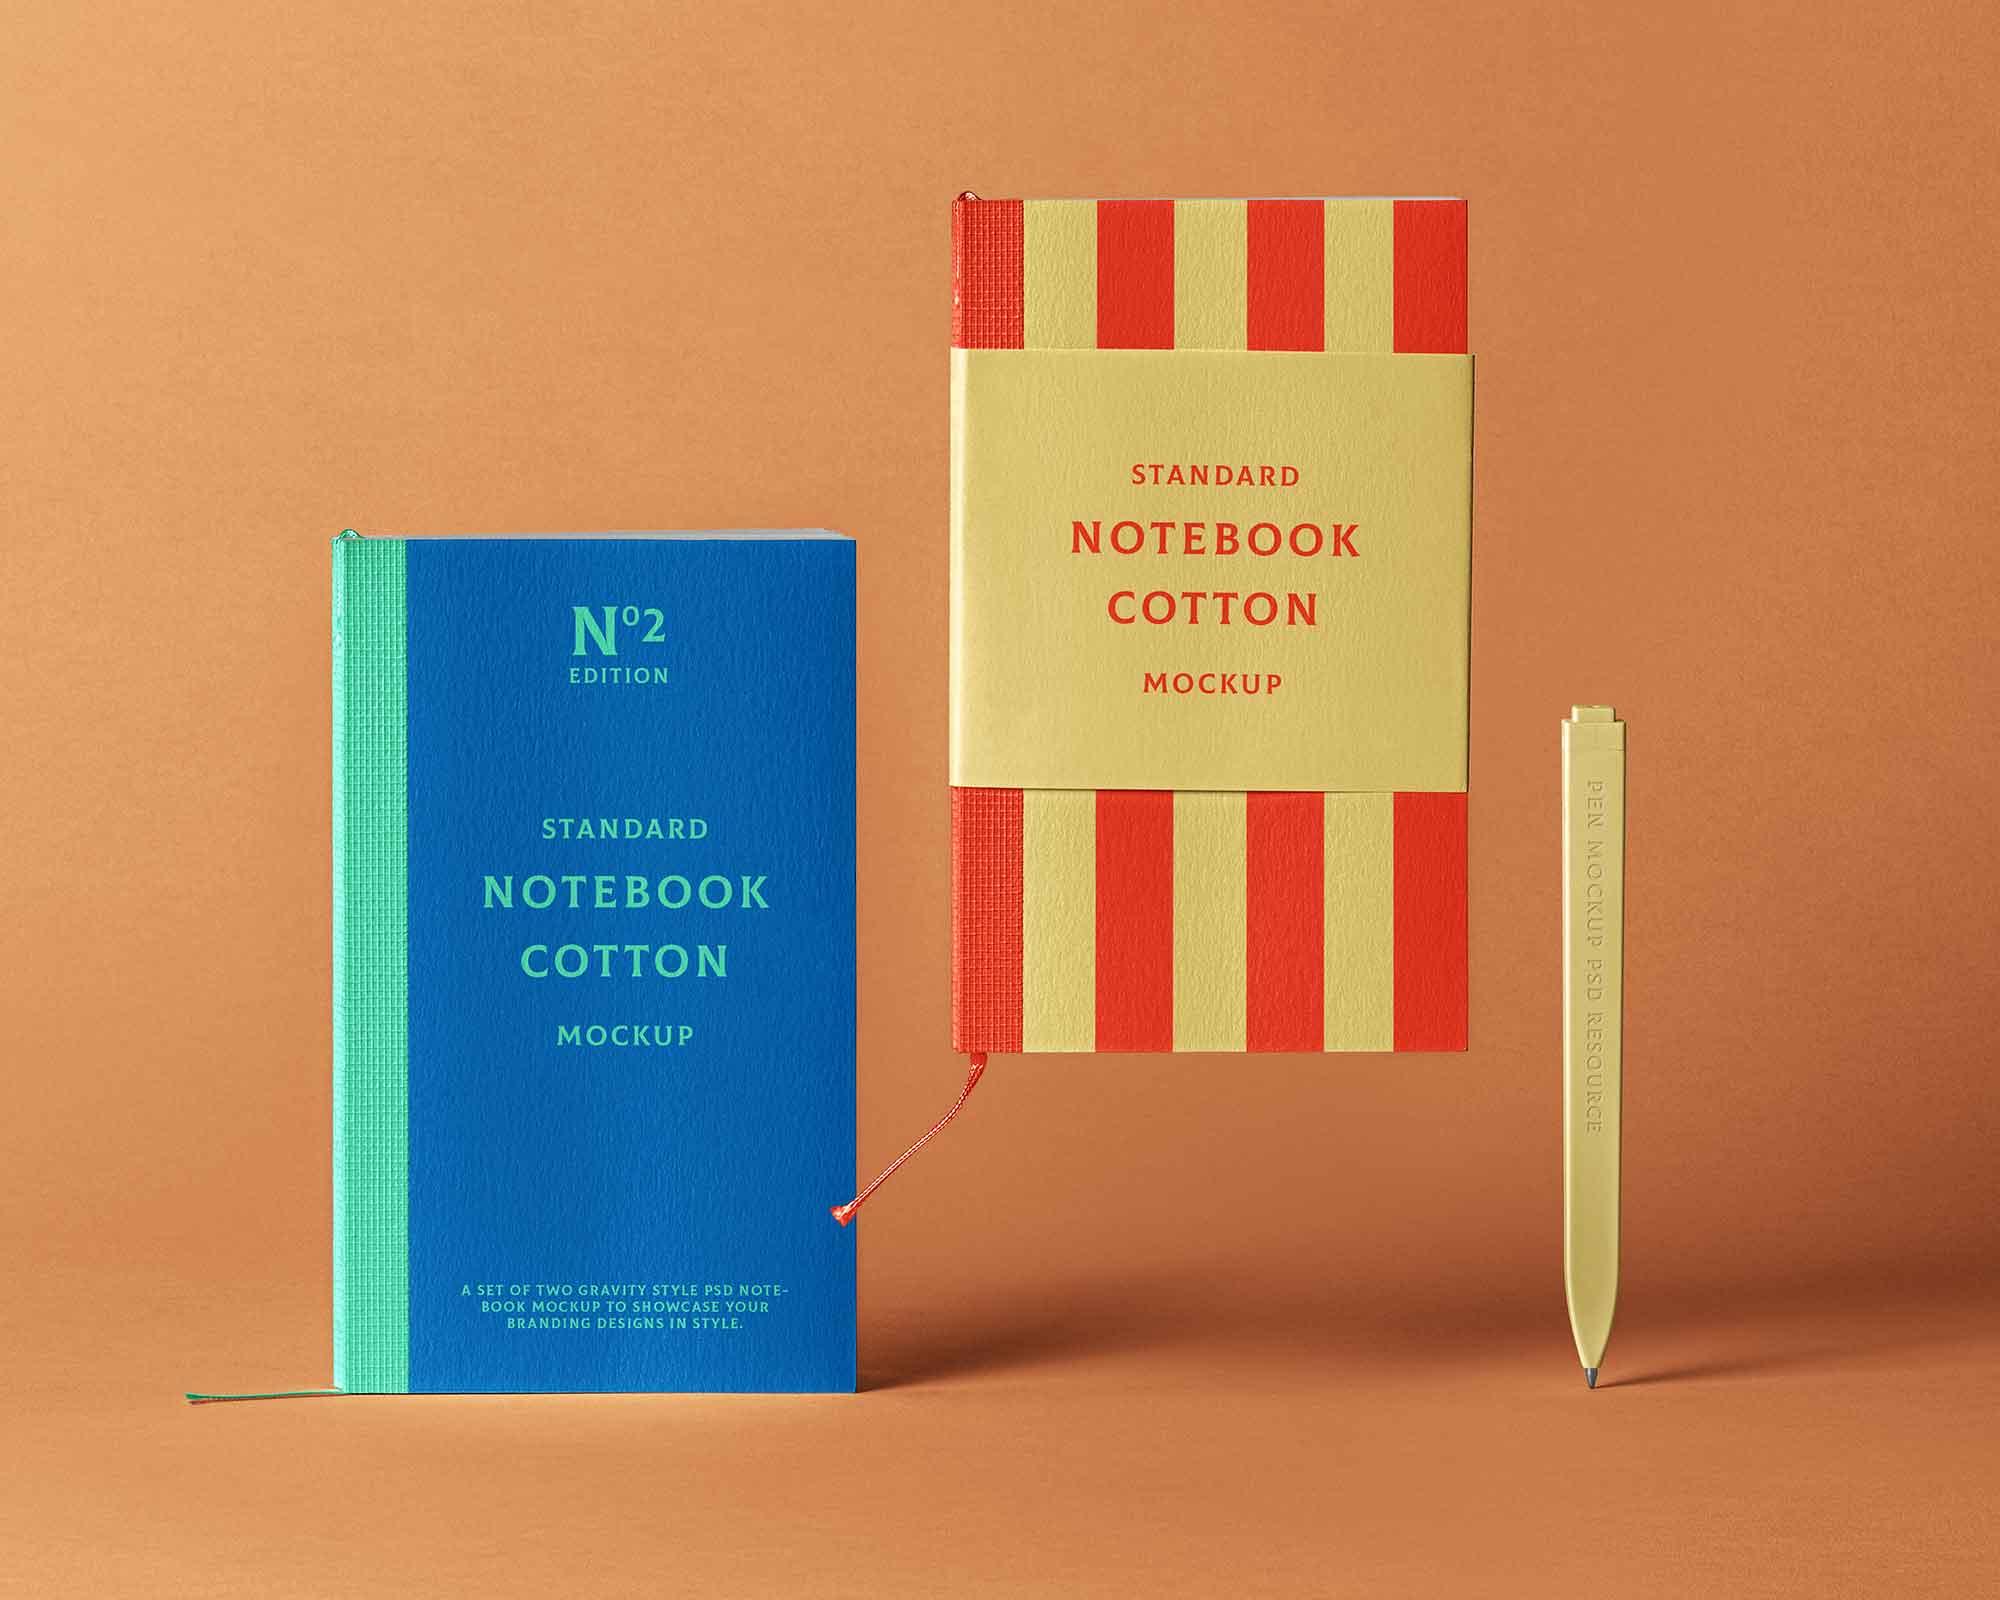 Cotton Notebook Mockup